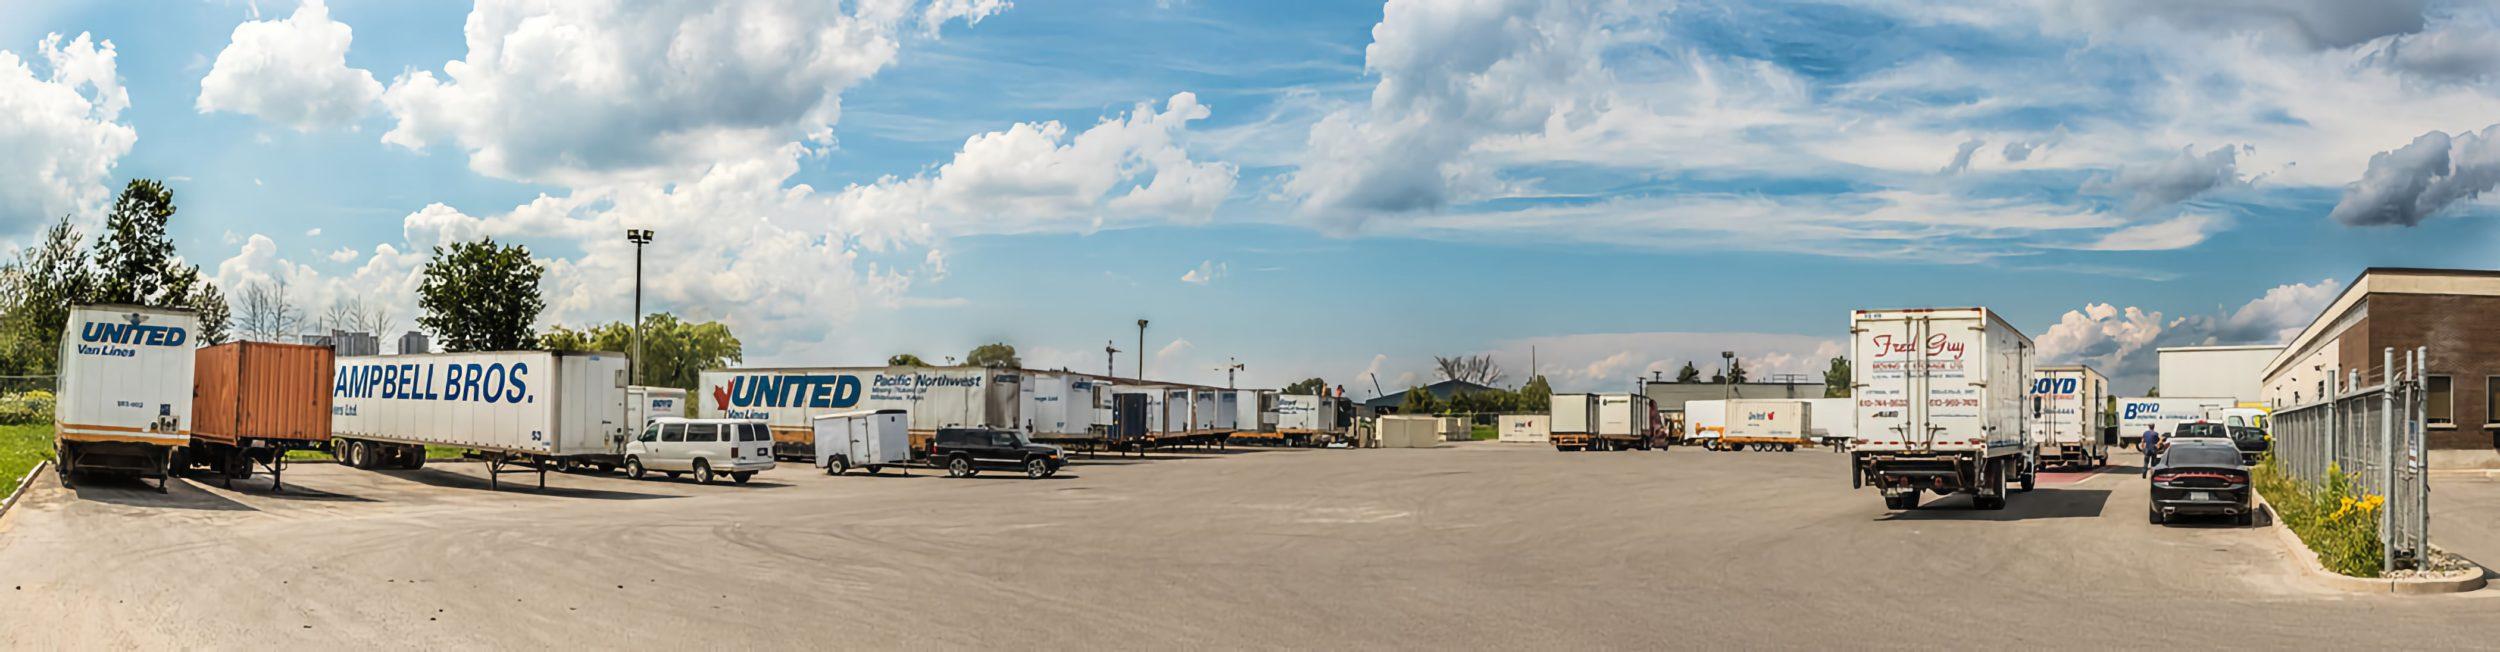 Boyd Moving - panarama shot of truck lot